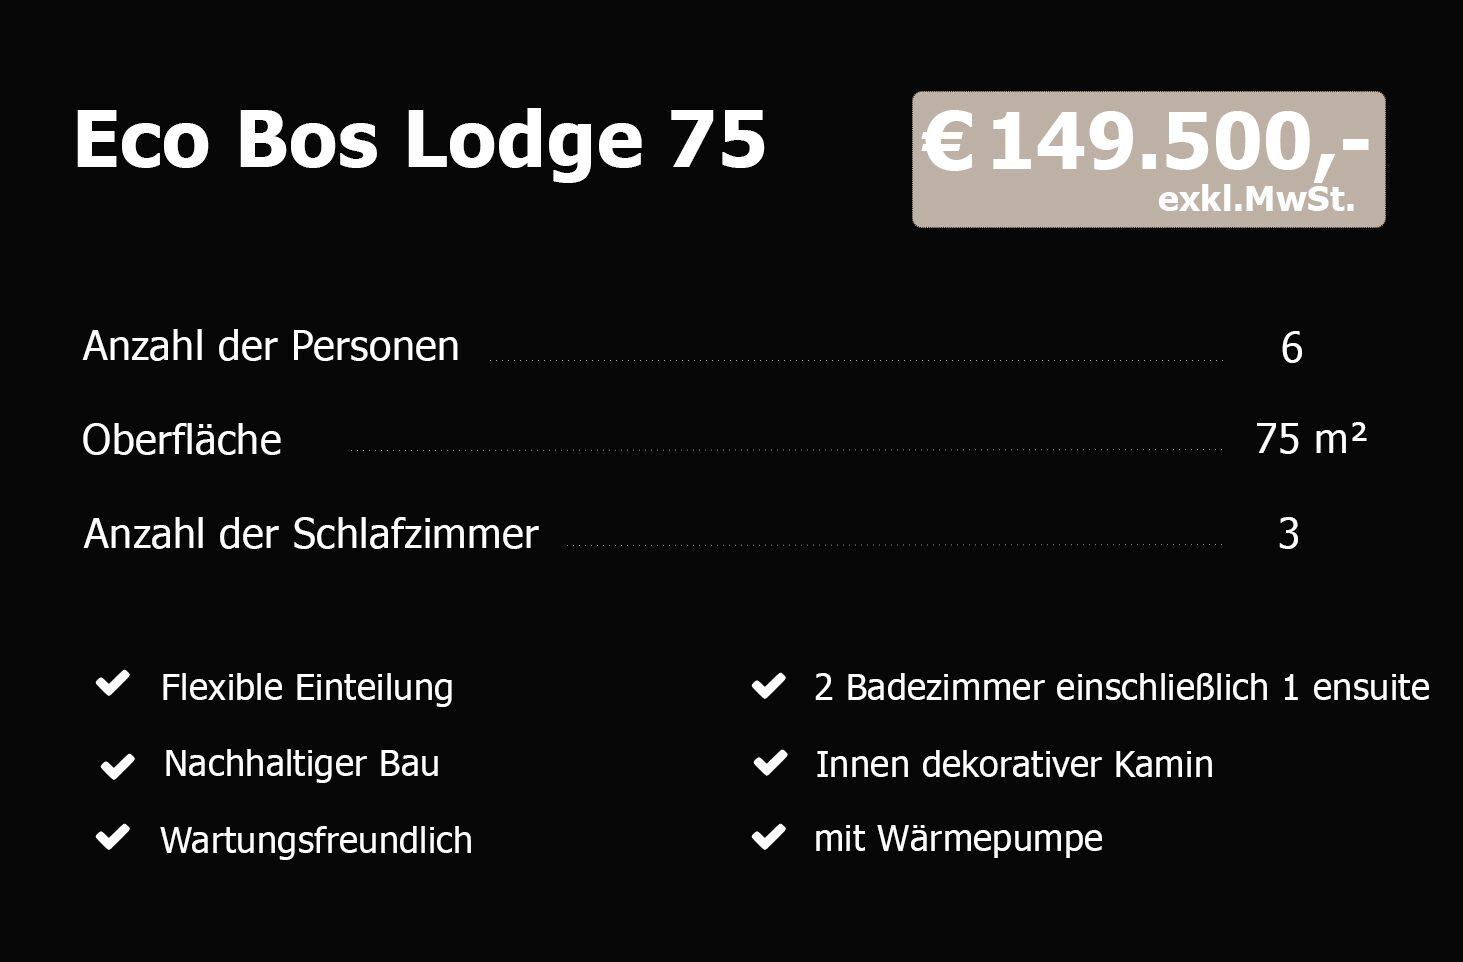 Eco Bos Lodge 75